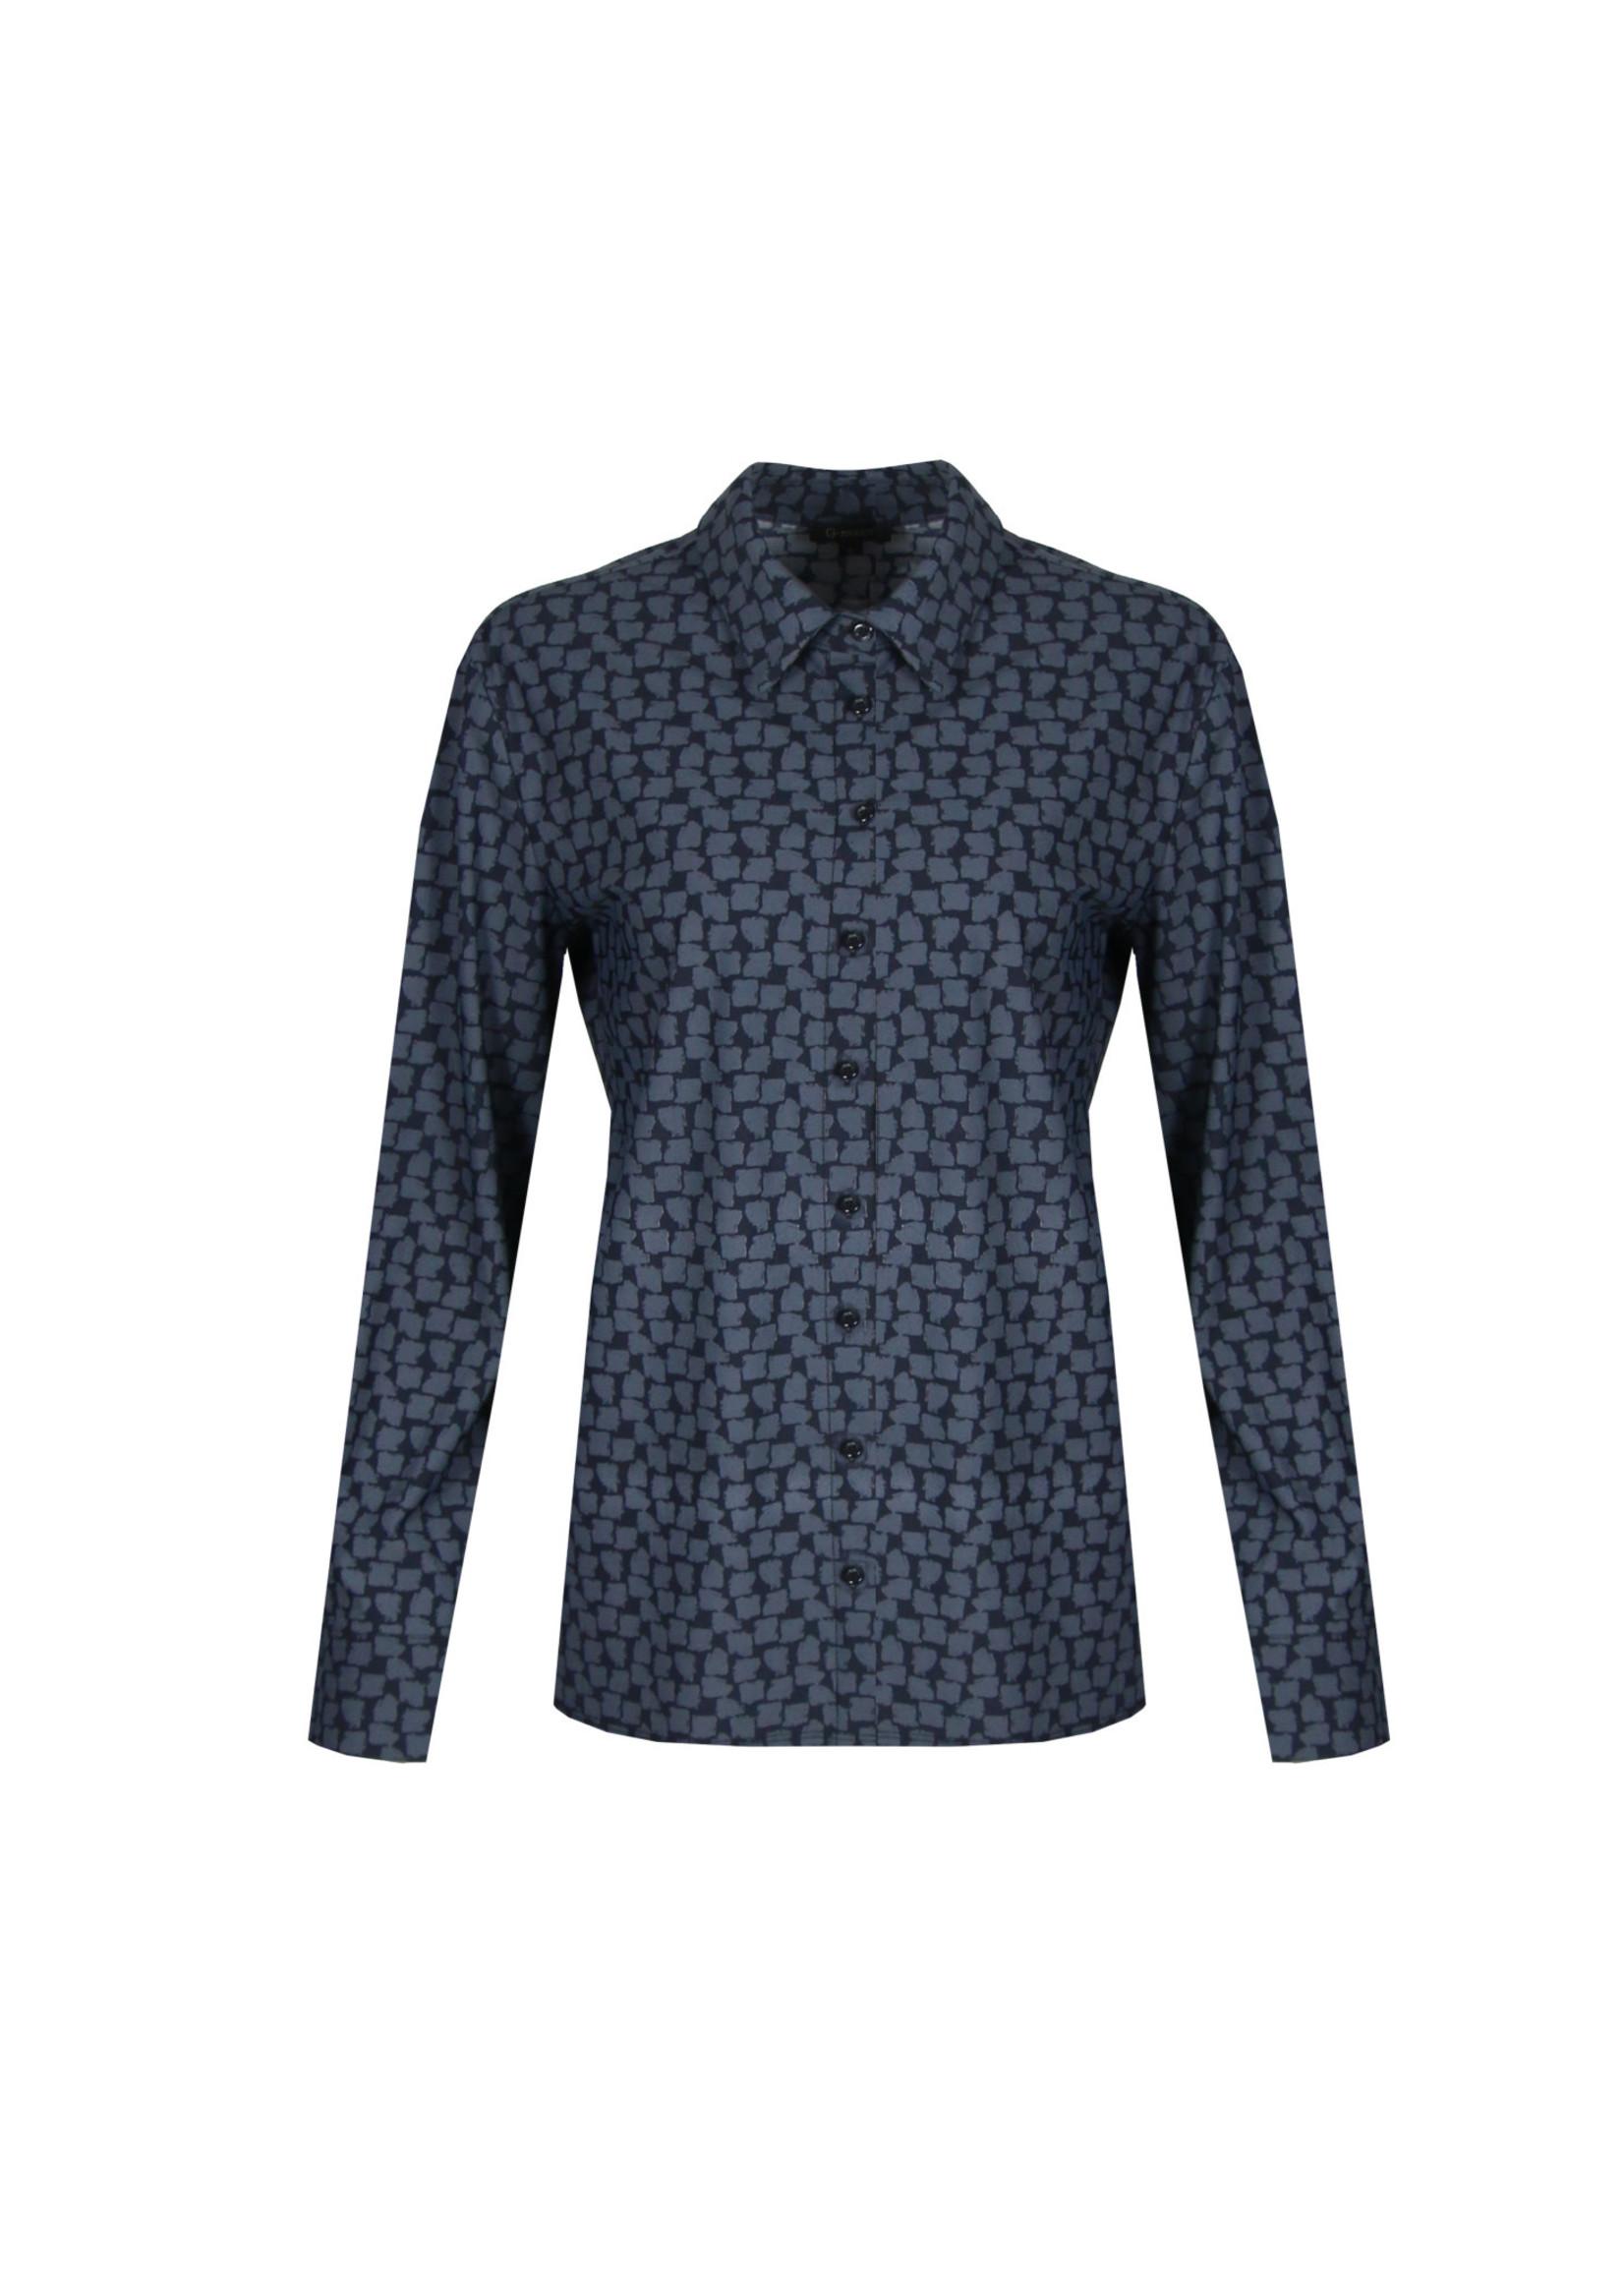 G-Maxx G-maxx - Amalia blouse - Zwart/jeansblauw